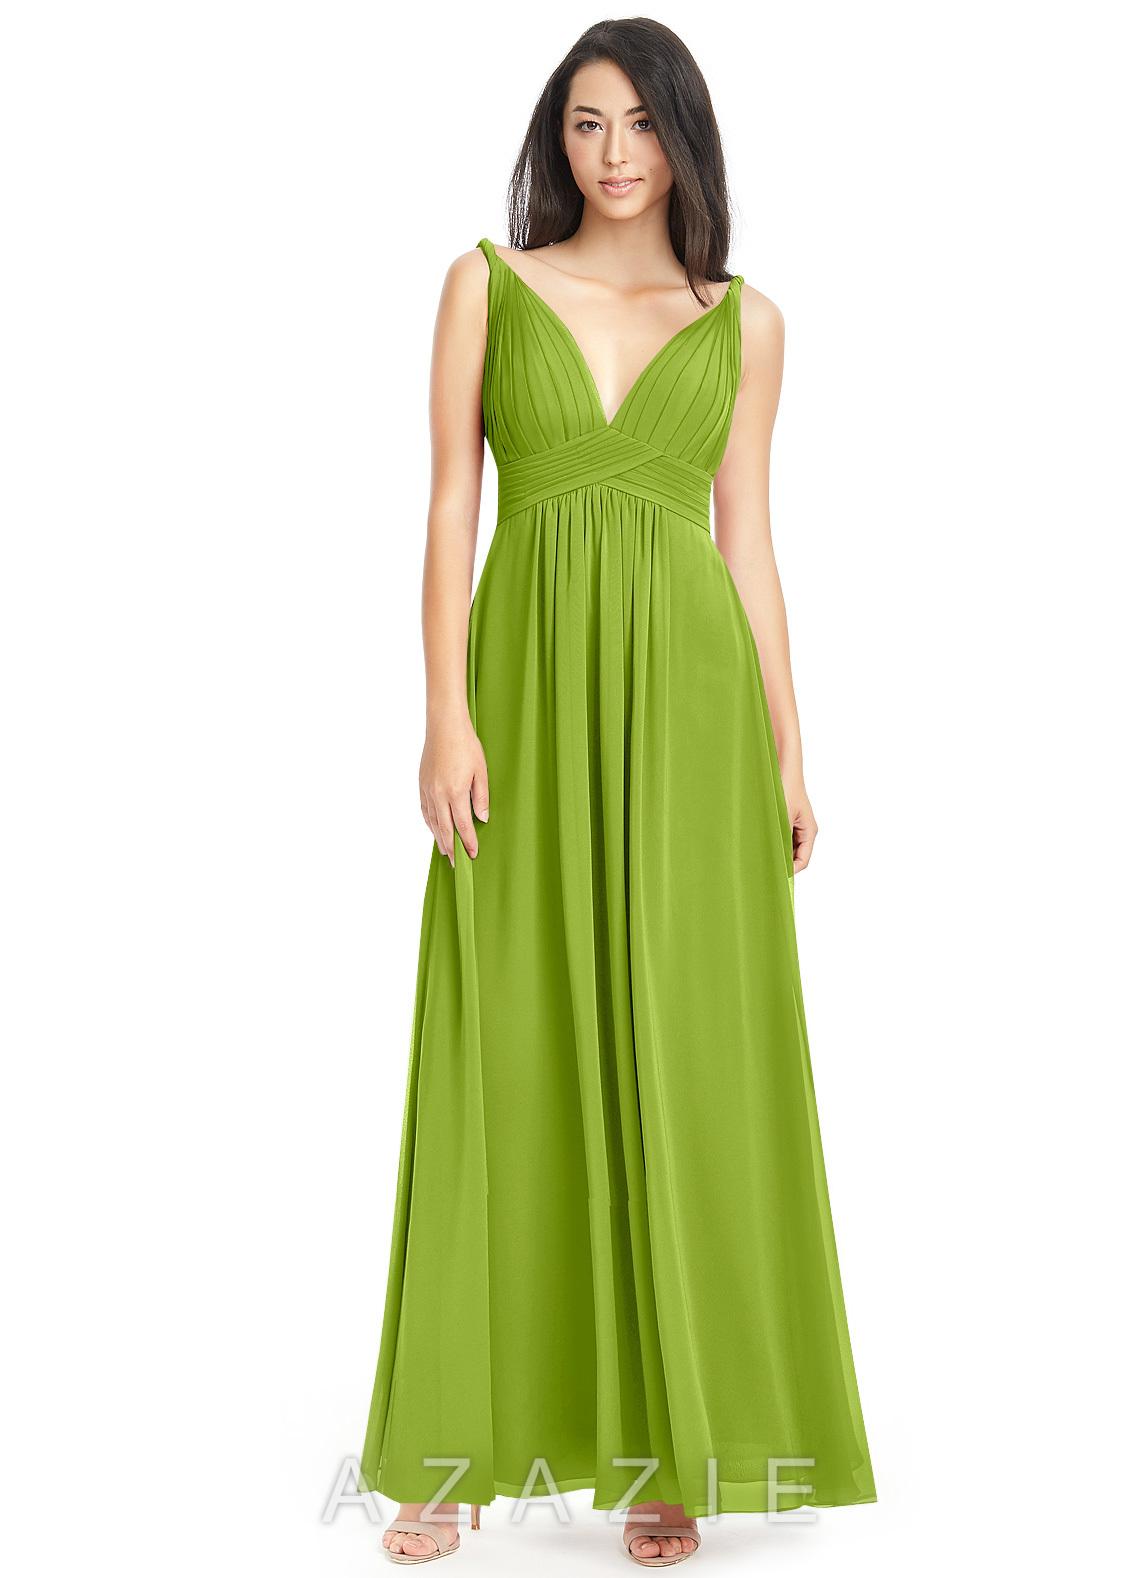 Azazie maren bridesmaid dress azazie loading zoom ombrellifo Choice Image